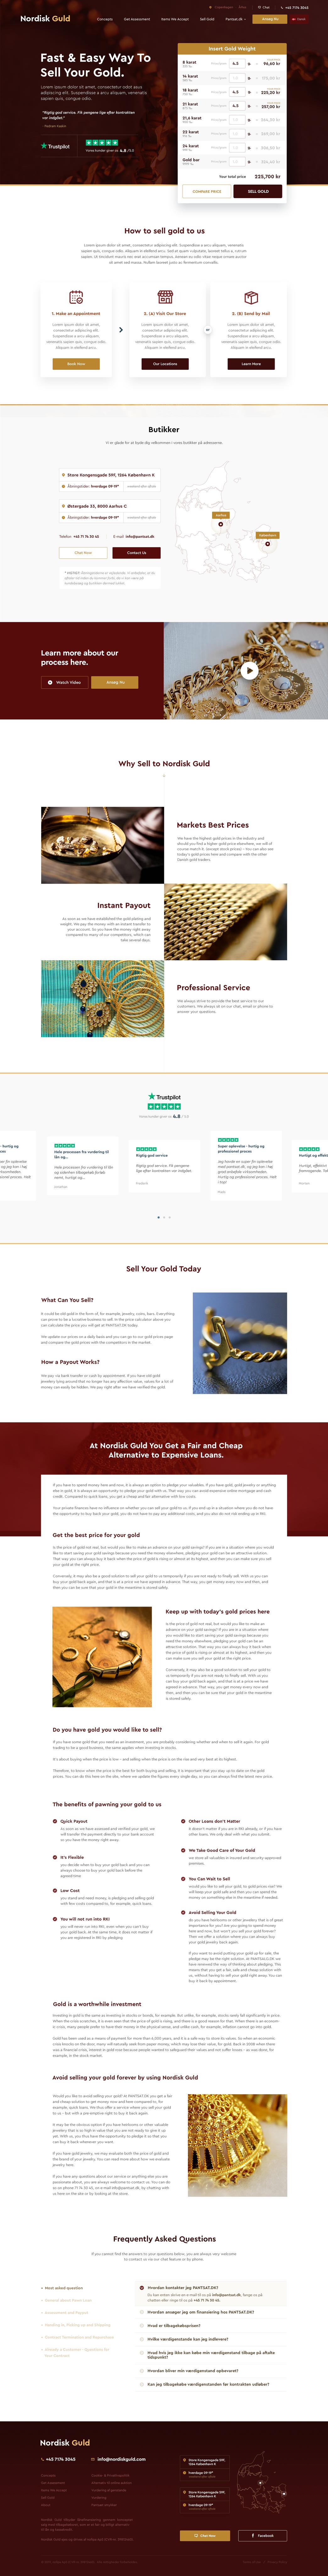 2 website design/identity